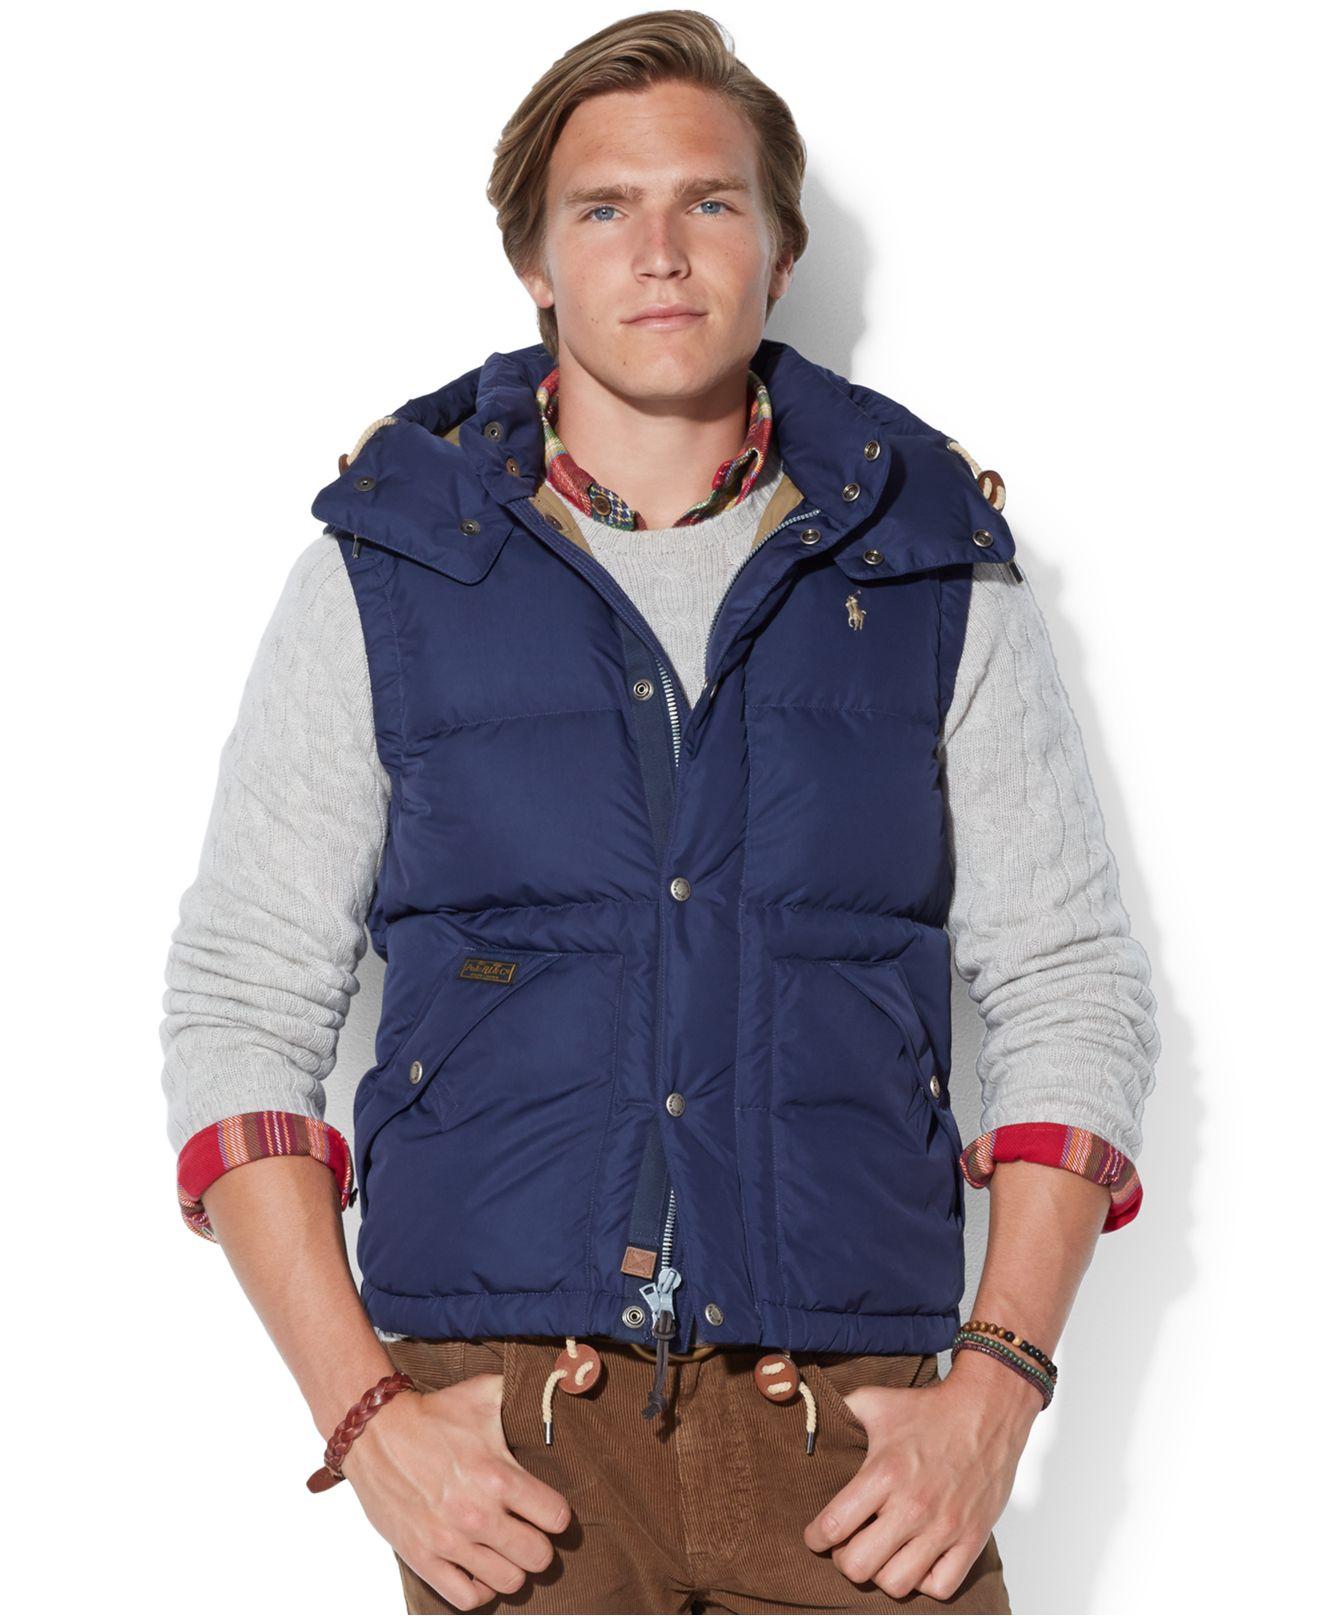 Lyst - Polo Ralph Lauren Elmwood Down Vest in Blue for Men